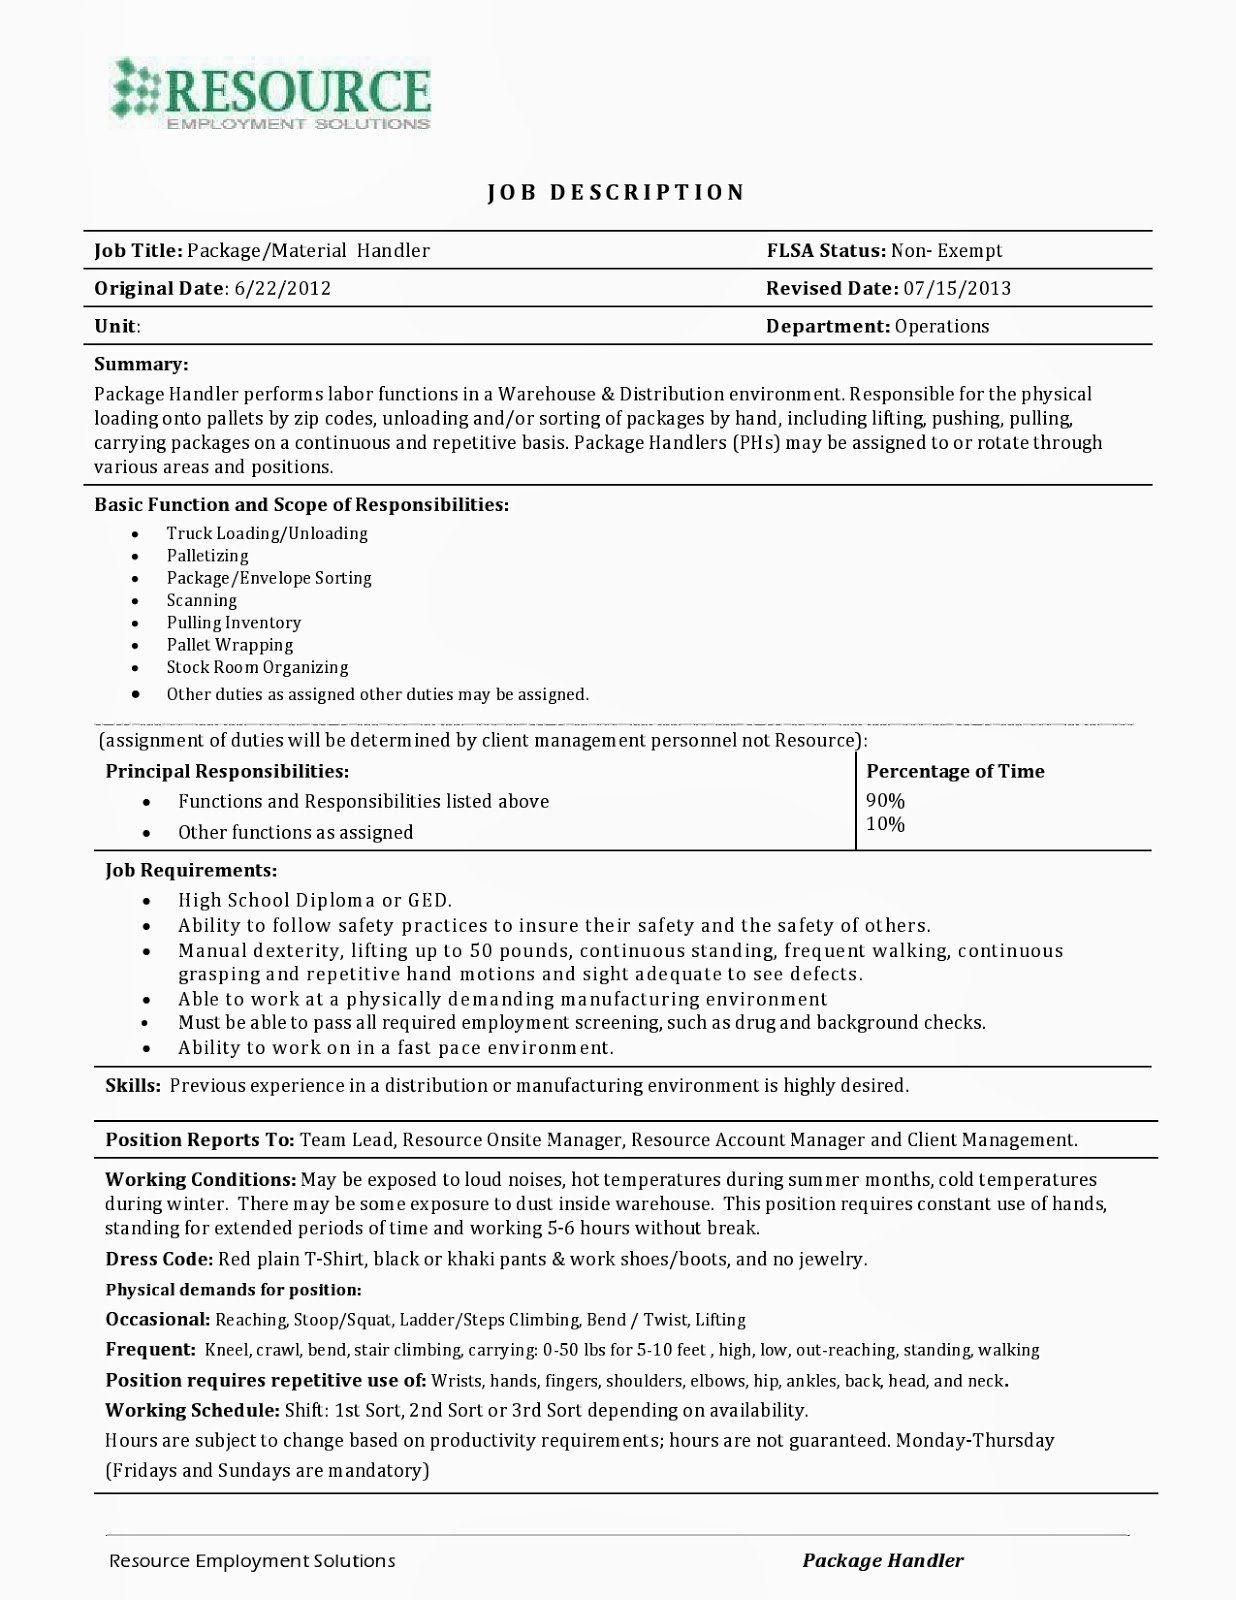 Fedex Package Handler Resume Lovely 12 13 Fedex Material Handler Resume Job Resume Samples Resume New Grad Nursing Resume